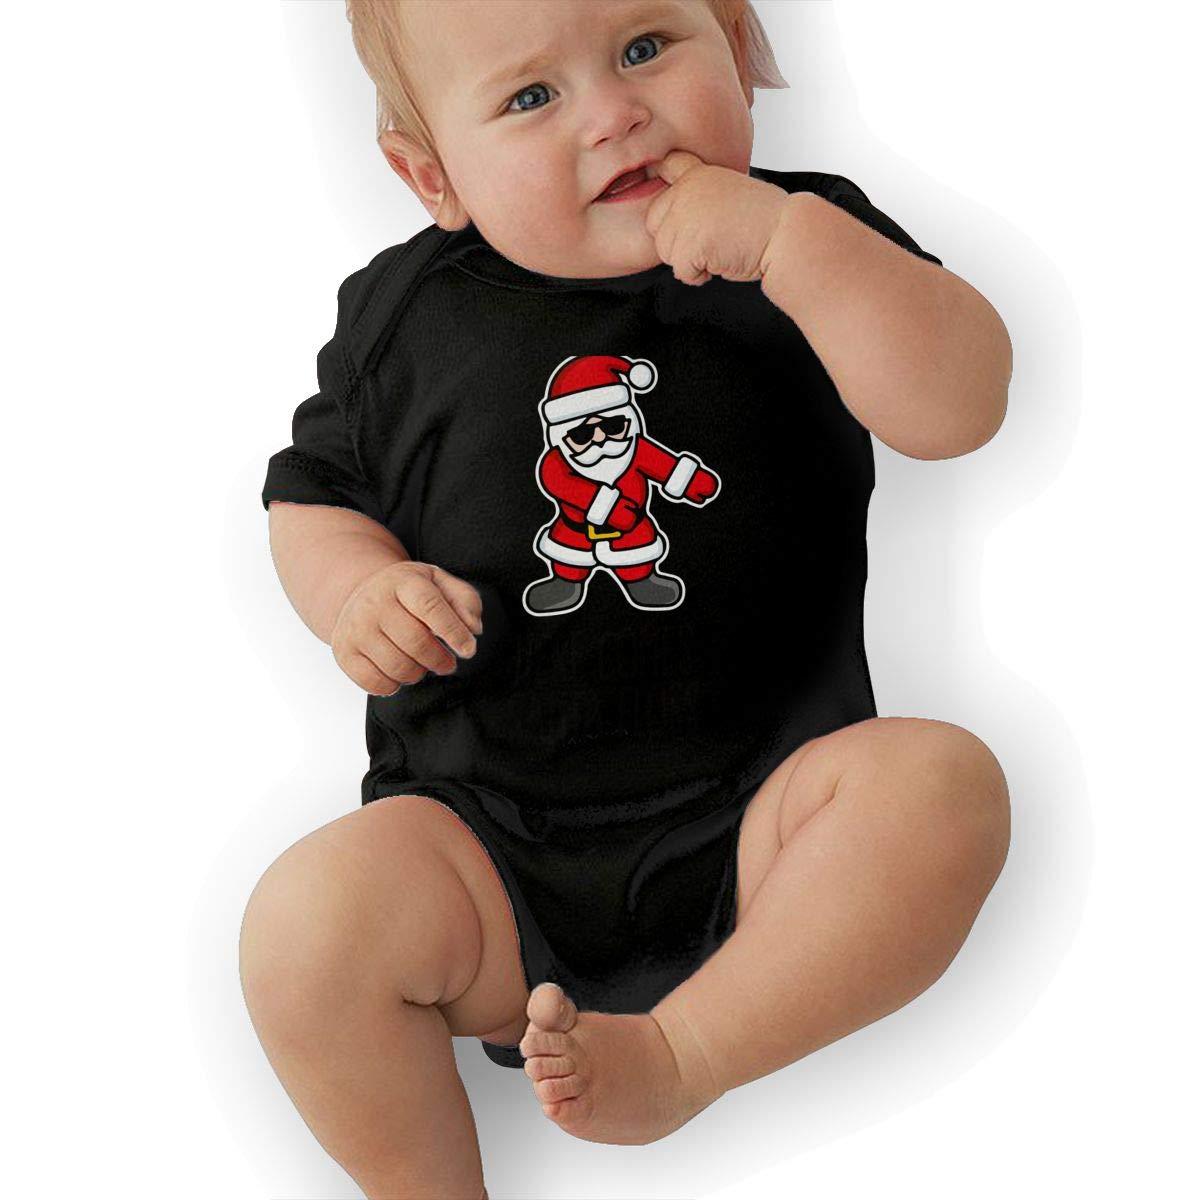 BONLOR Santa Floss Dance Baby Boys Girls Jumpsuit Overall Romper Bodysuit Summer Clothes Black